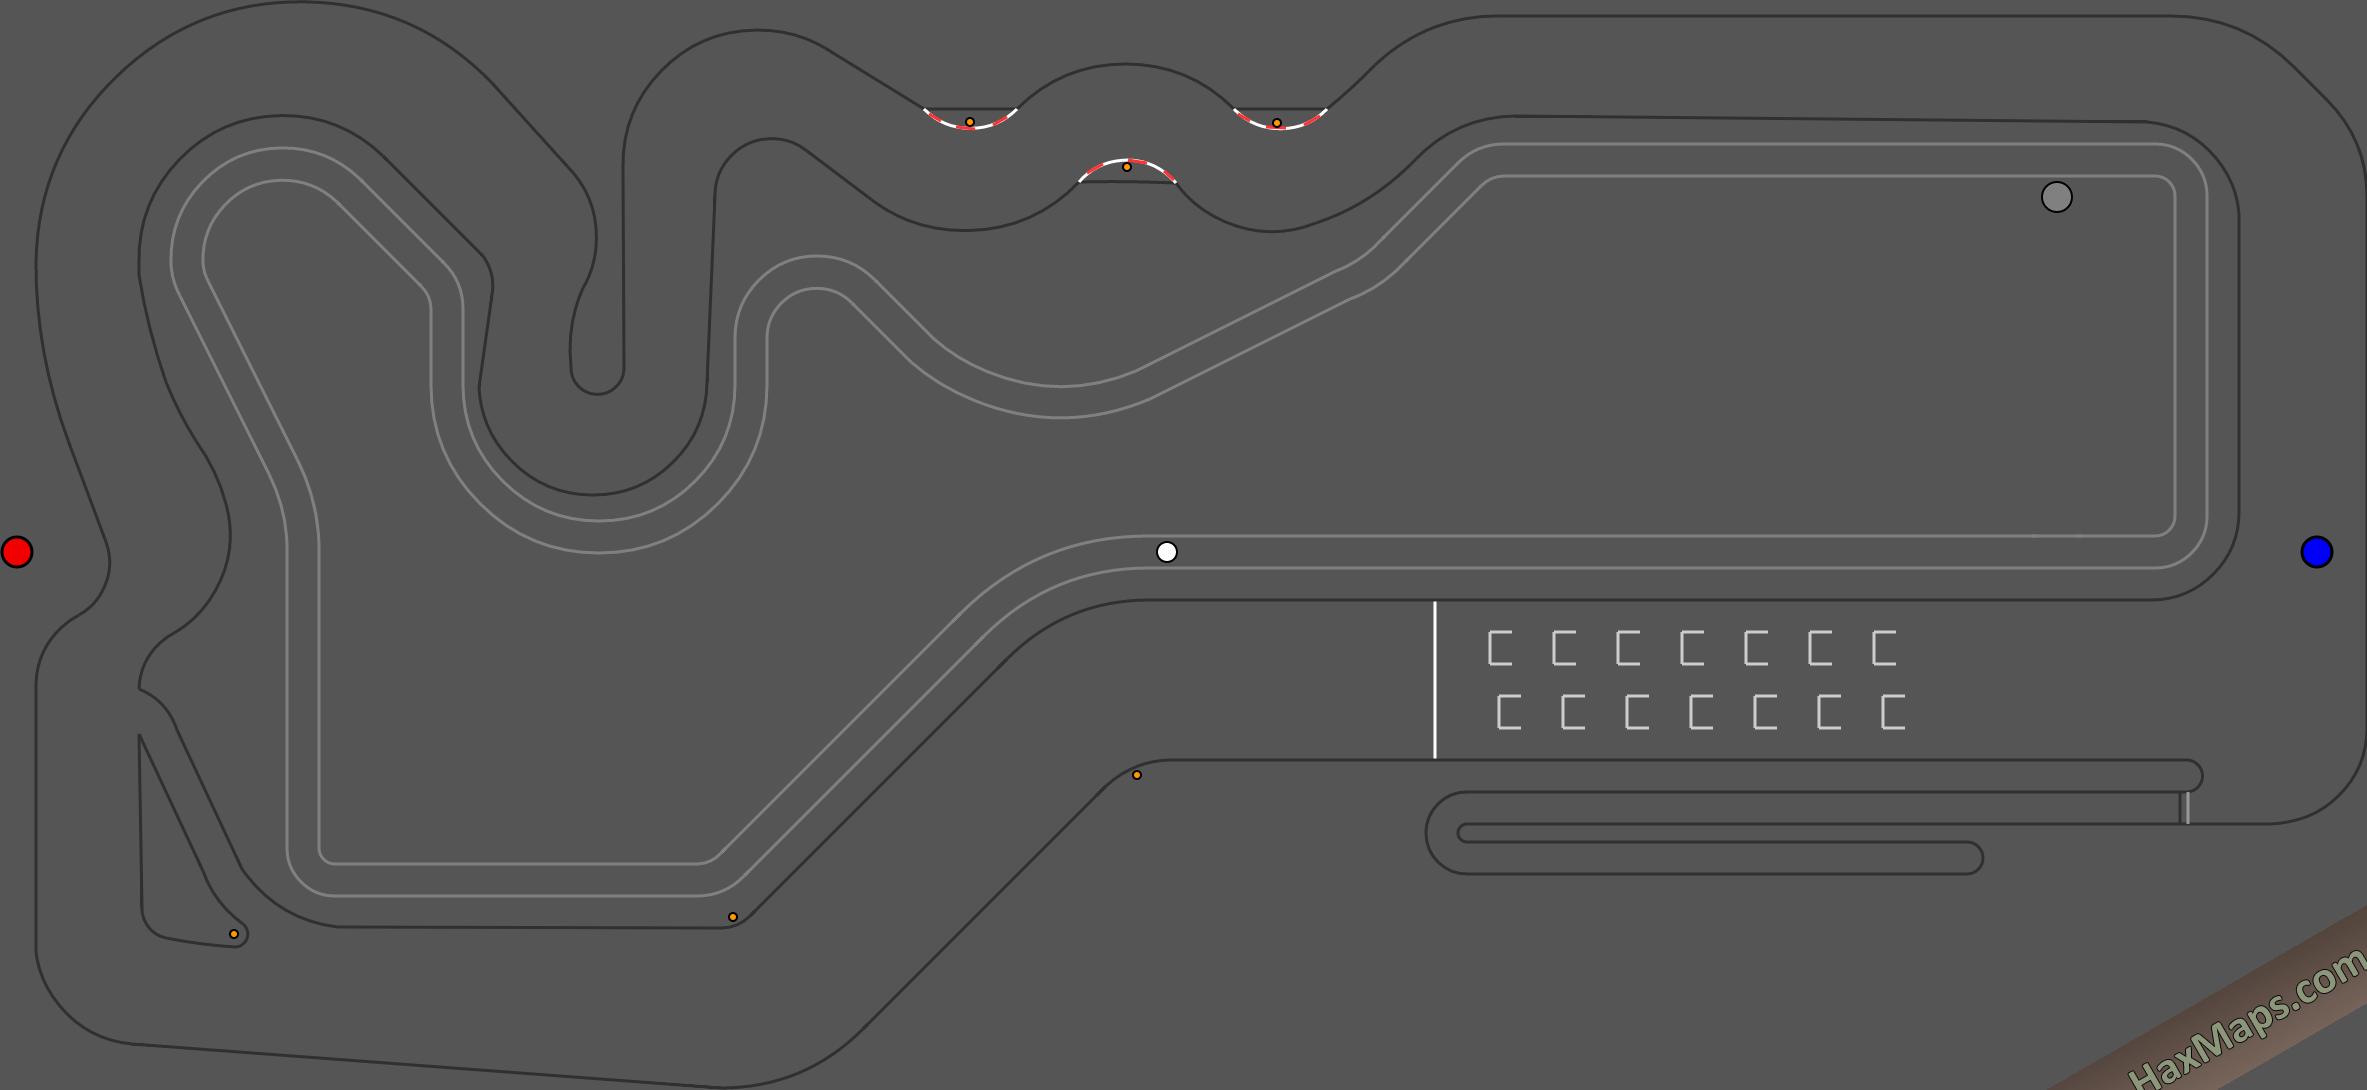 hax ball maps | Kouki's 1.12 [mod MC] +2